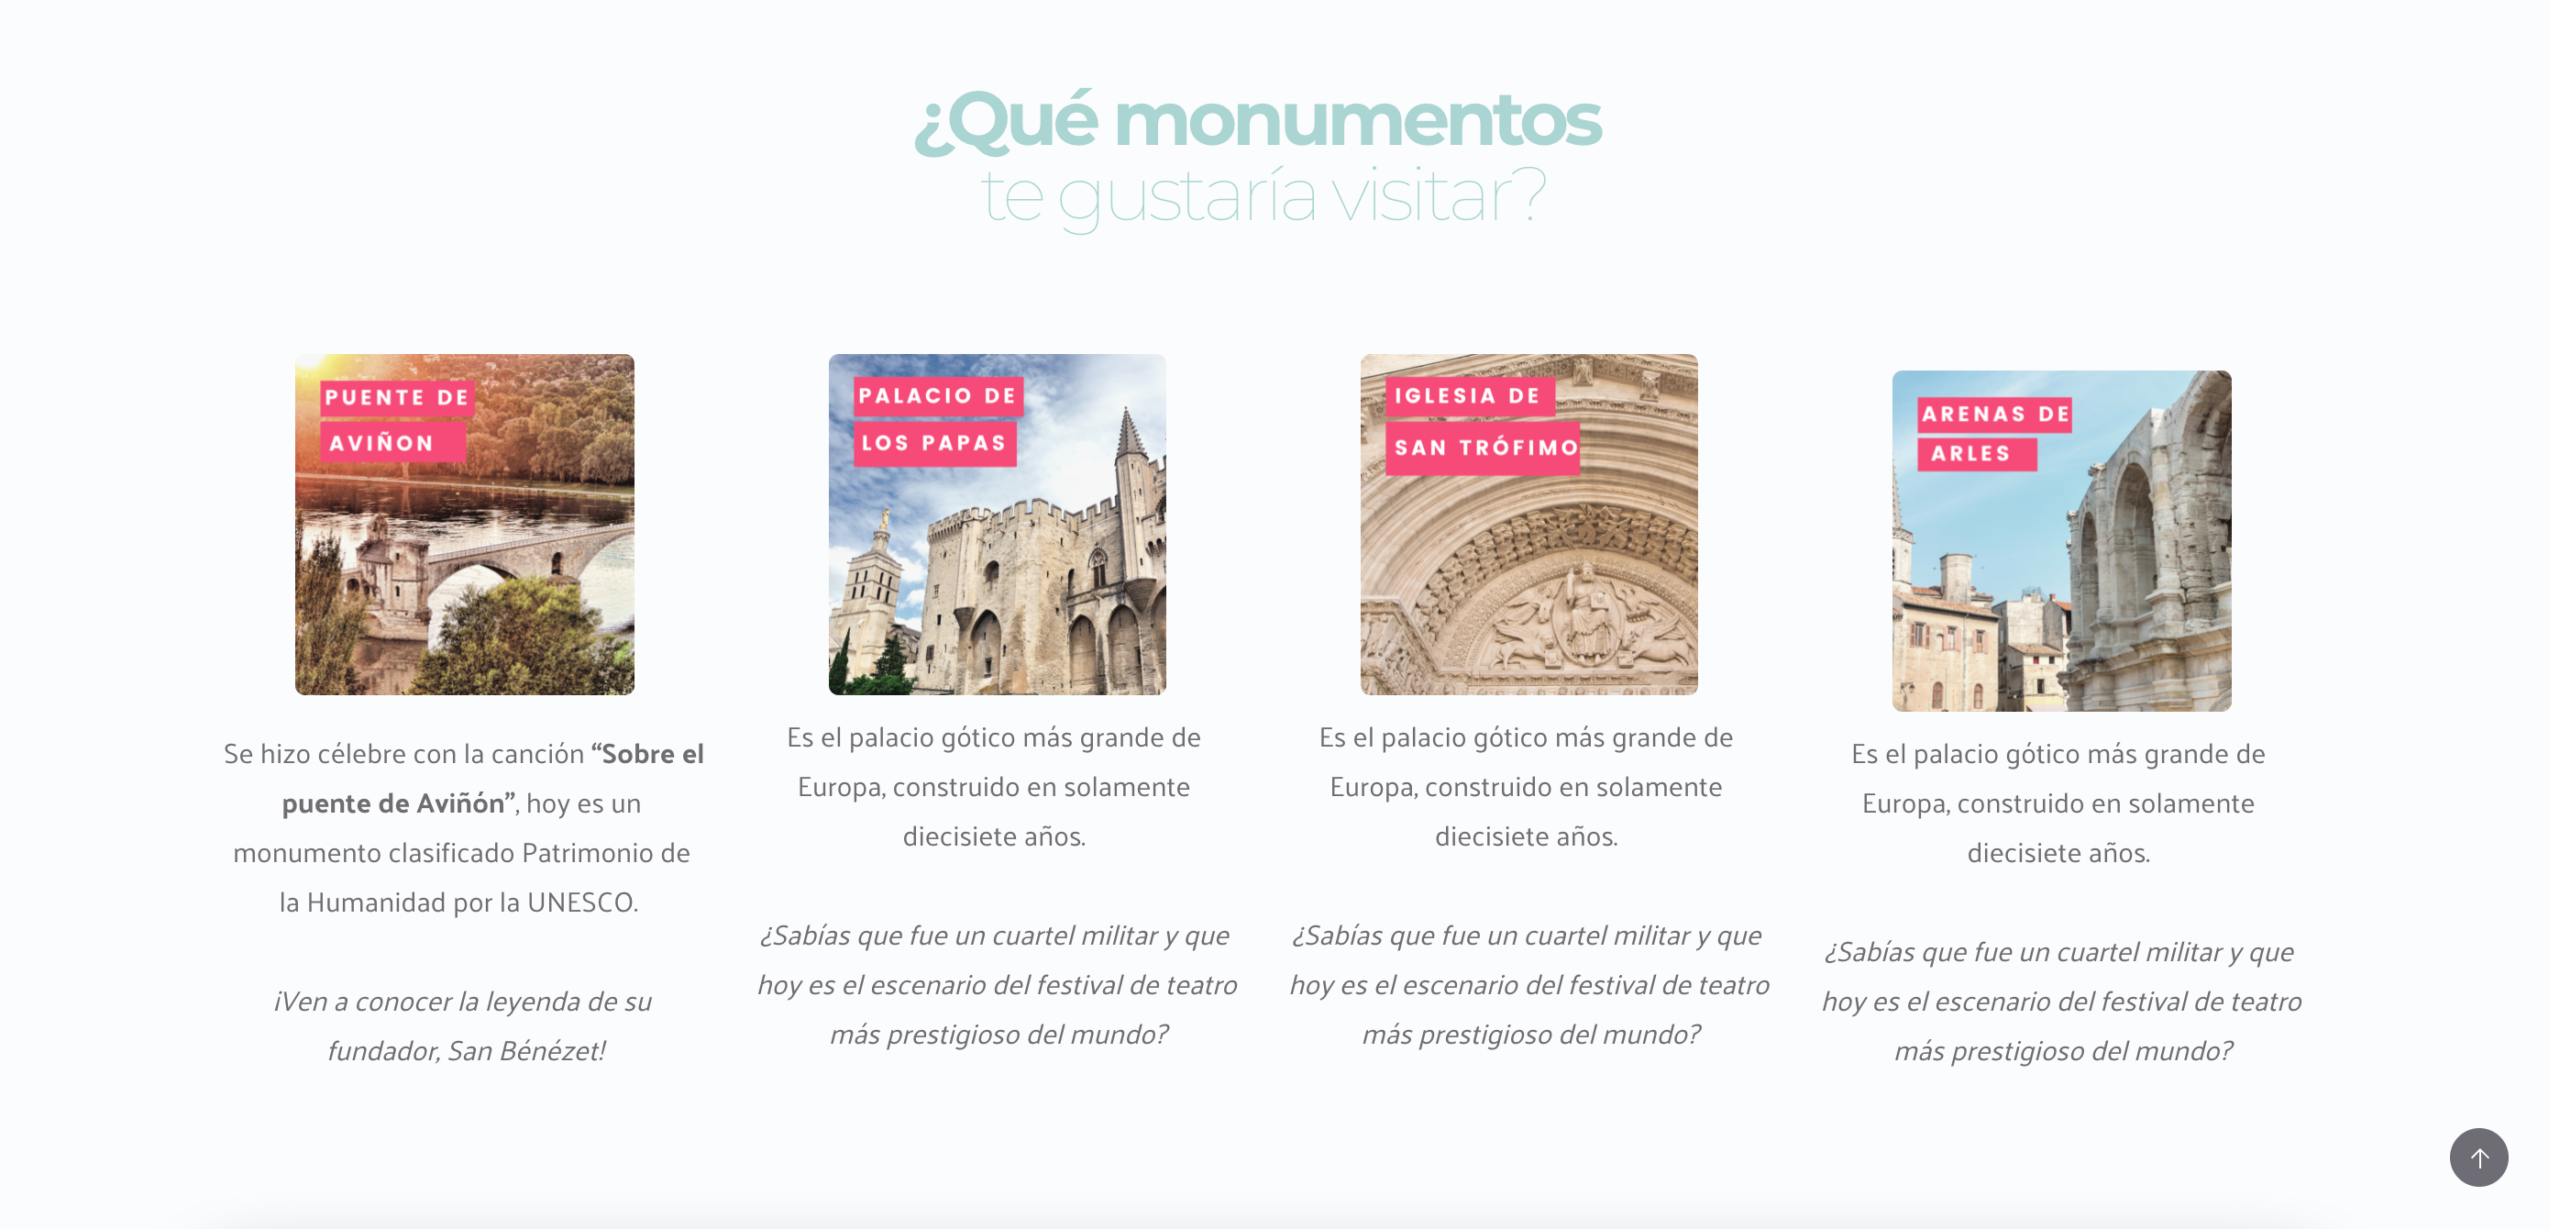 Monumentos - Las visitas guiadas de Celeste